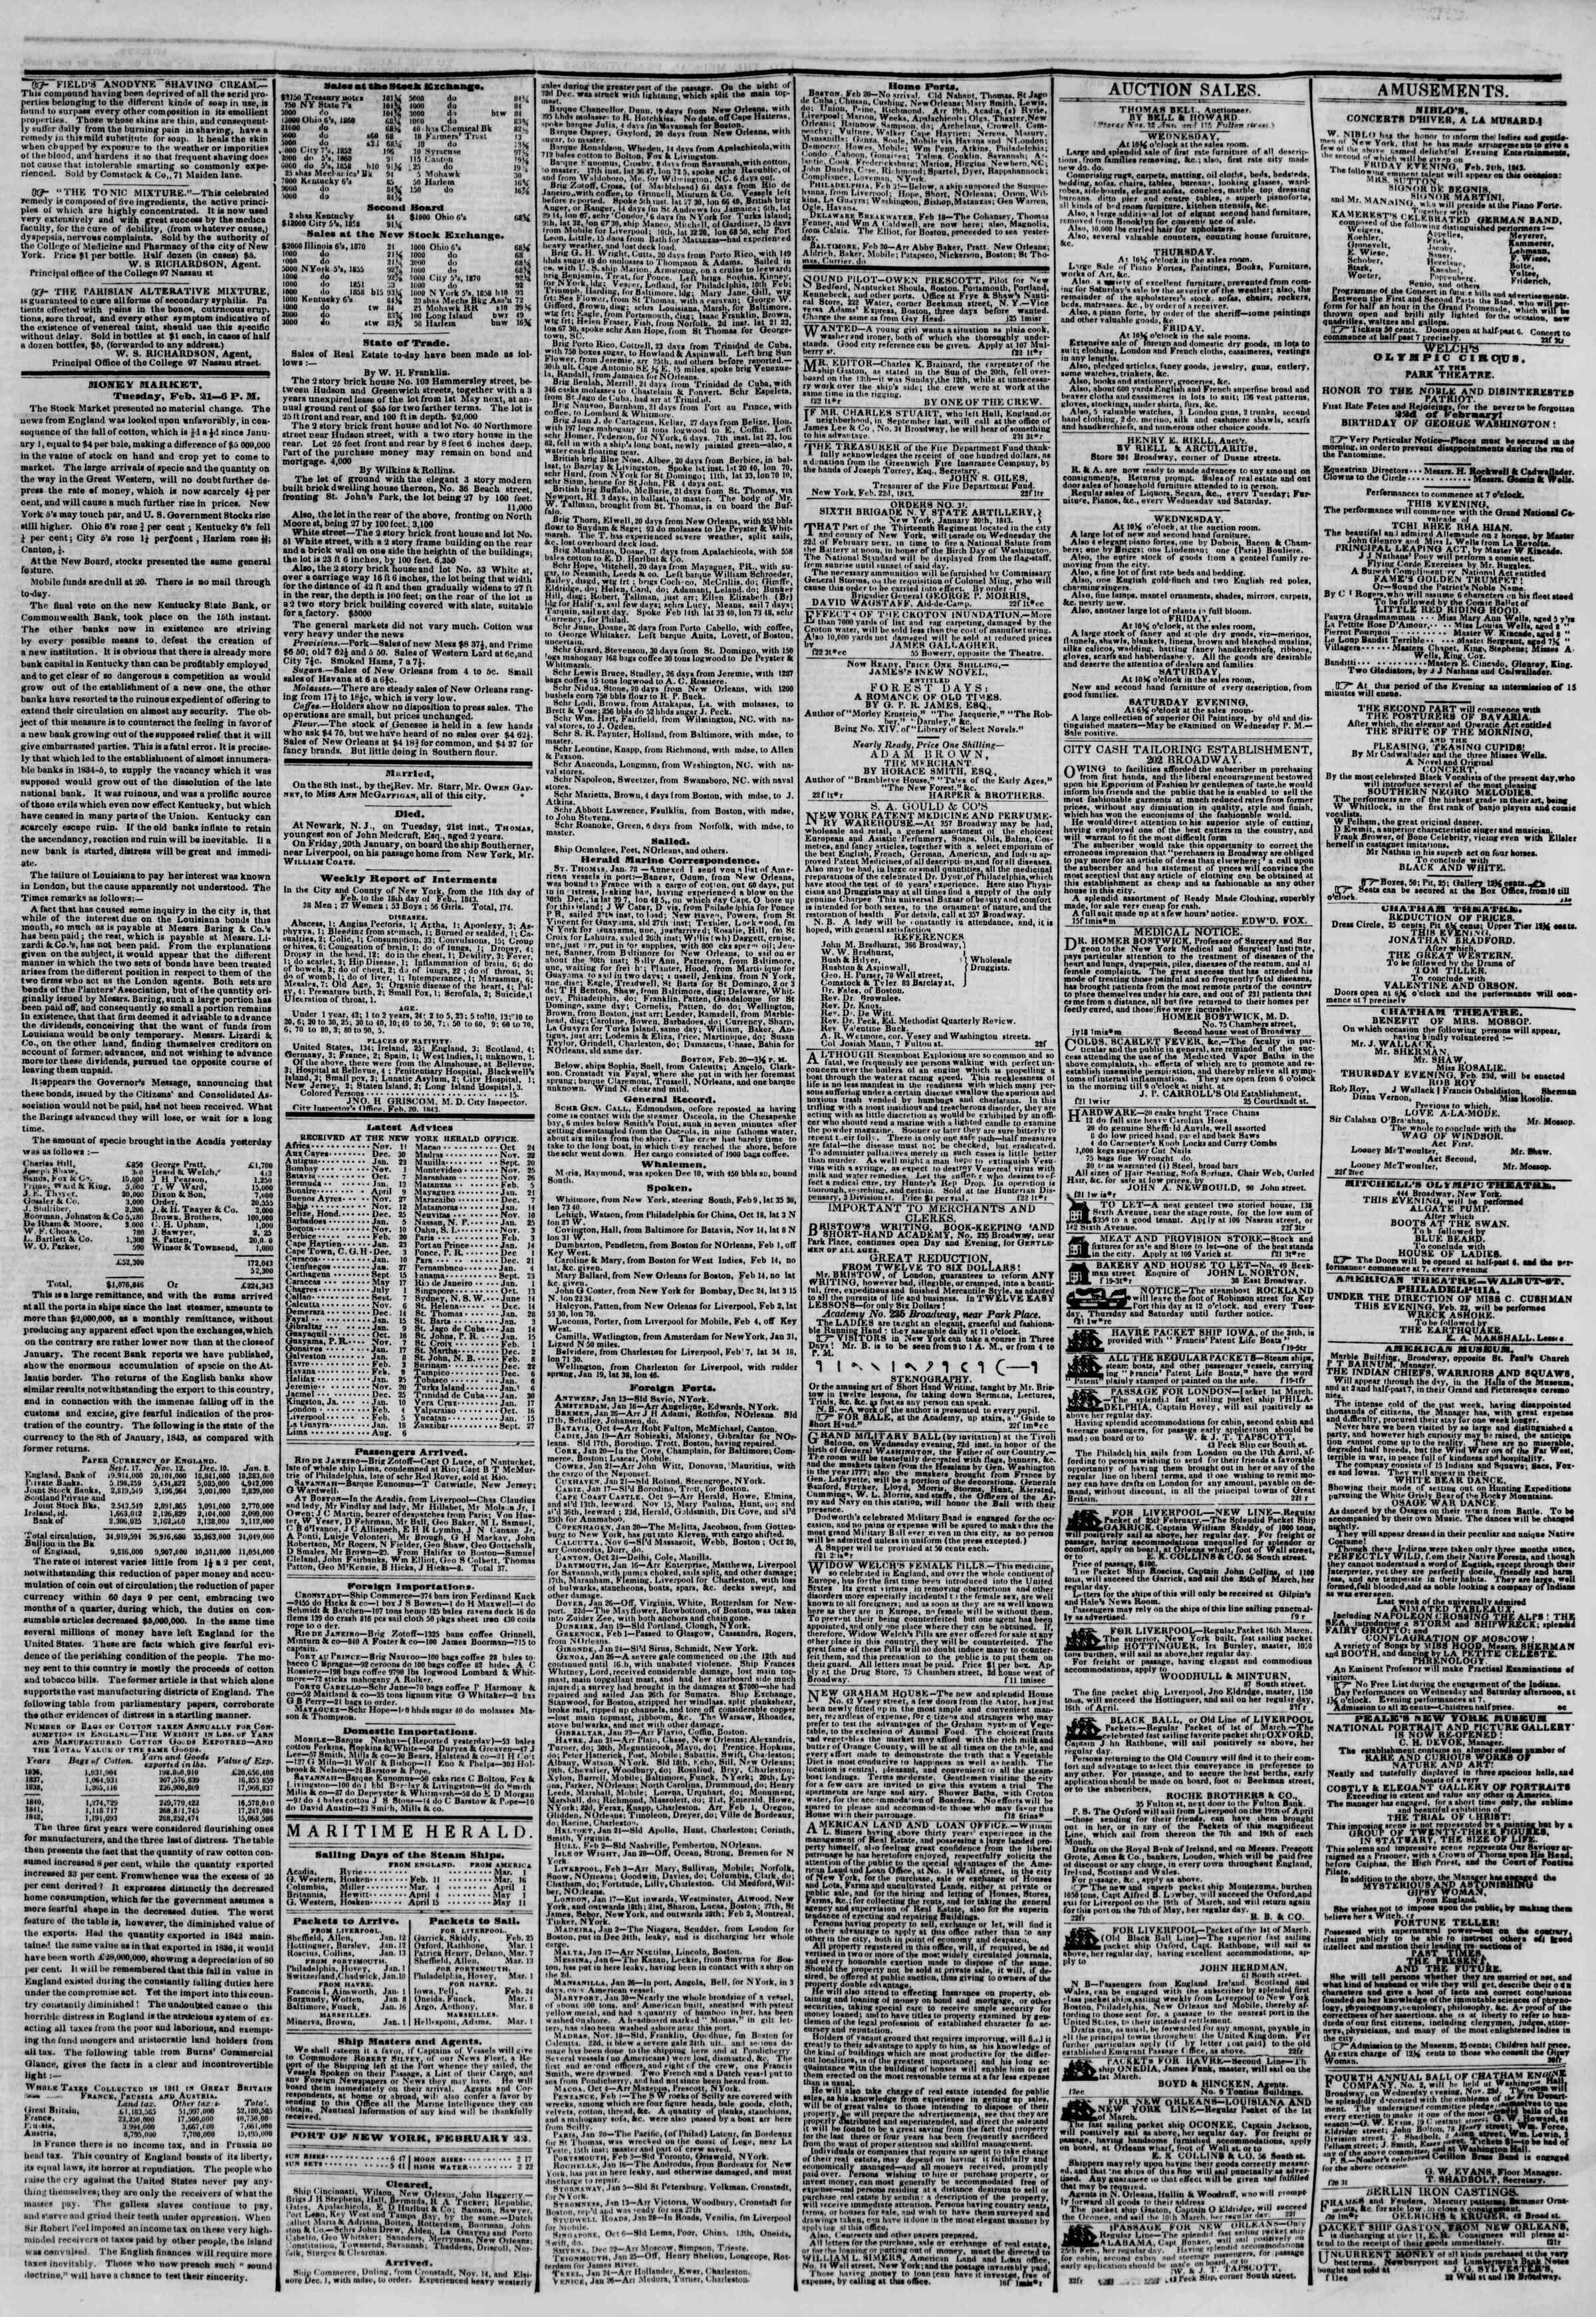 February 22, 1843 Tarihli The New York Herald Gazetesi Sayfa 3